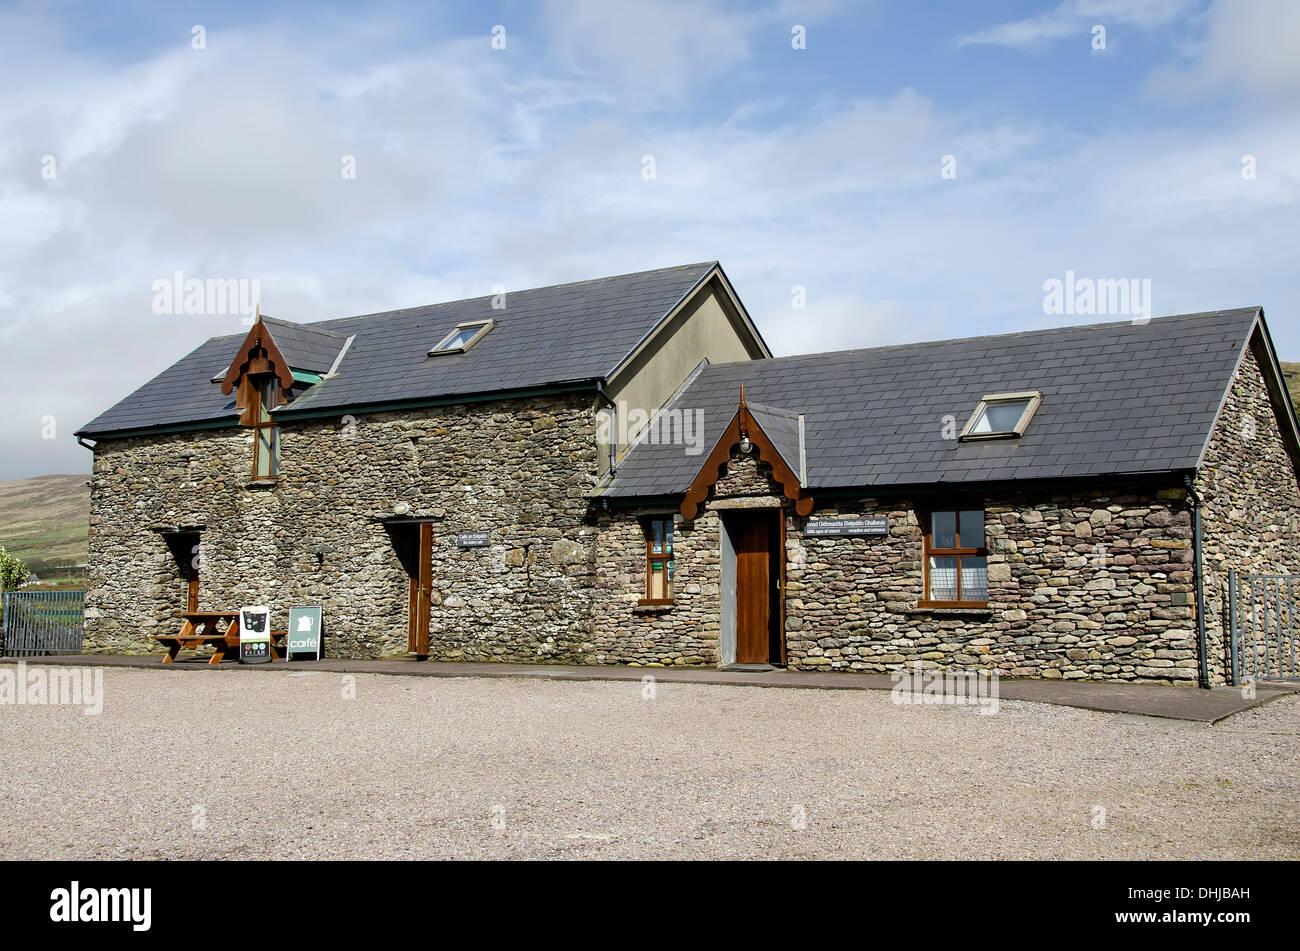 Gallus Oratory Visitor Center near the famous stone church, Ireland. - Stock Image